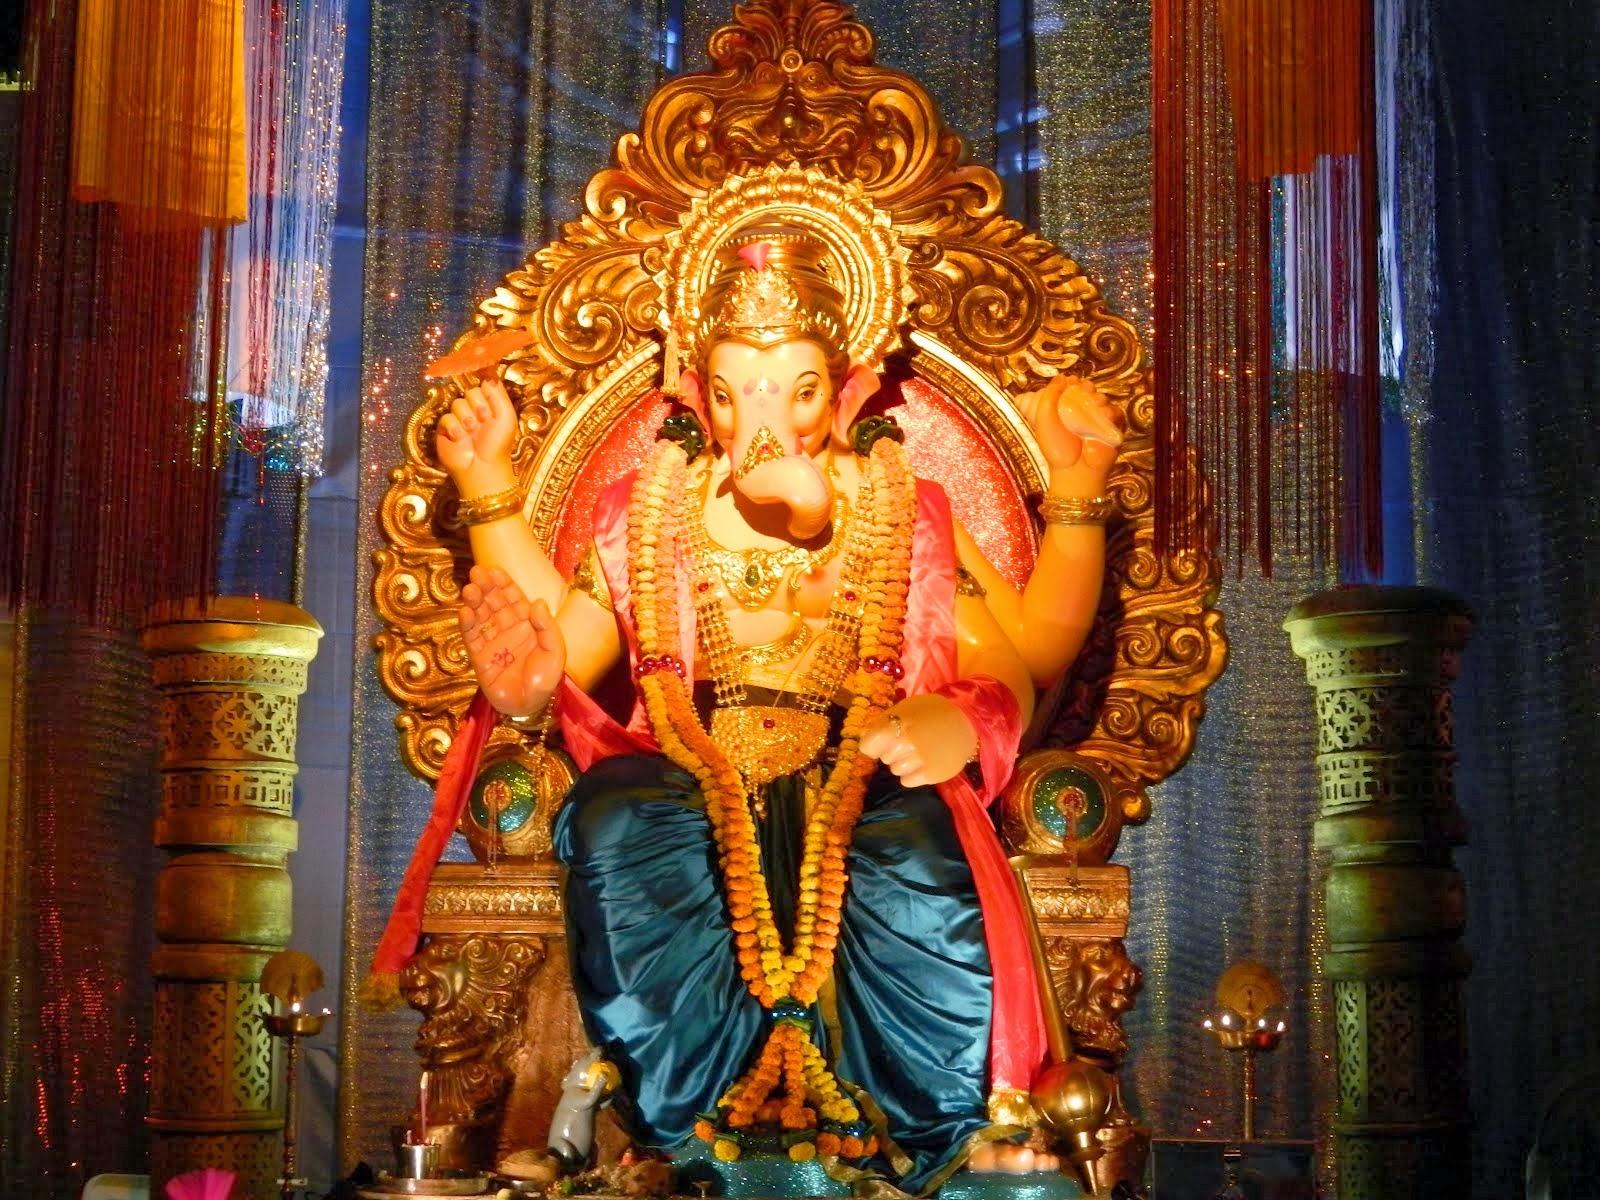 Download Images Of Lord Ganesha: Hindu God Wallpapers Download